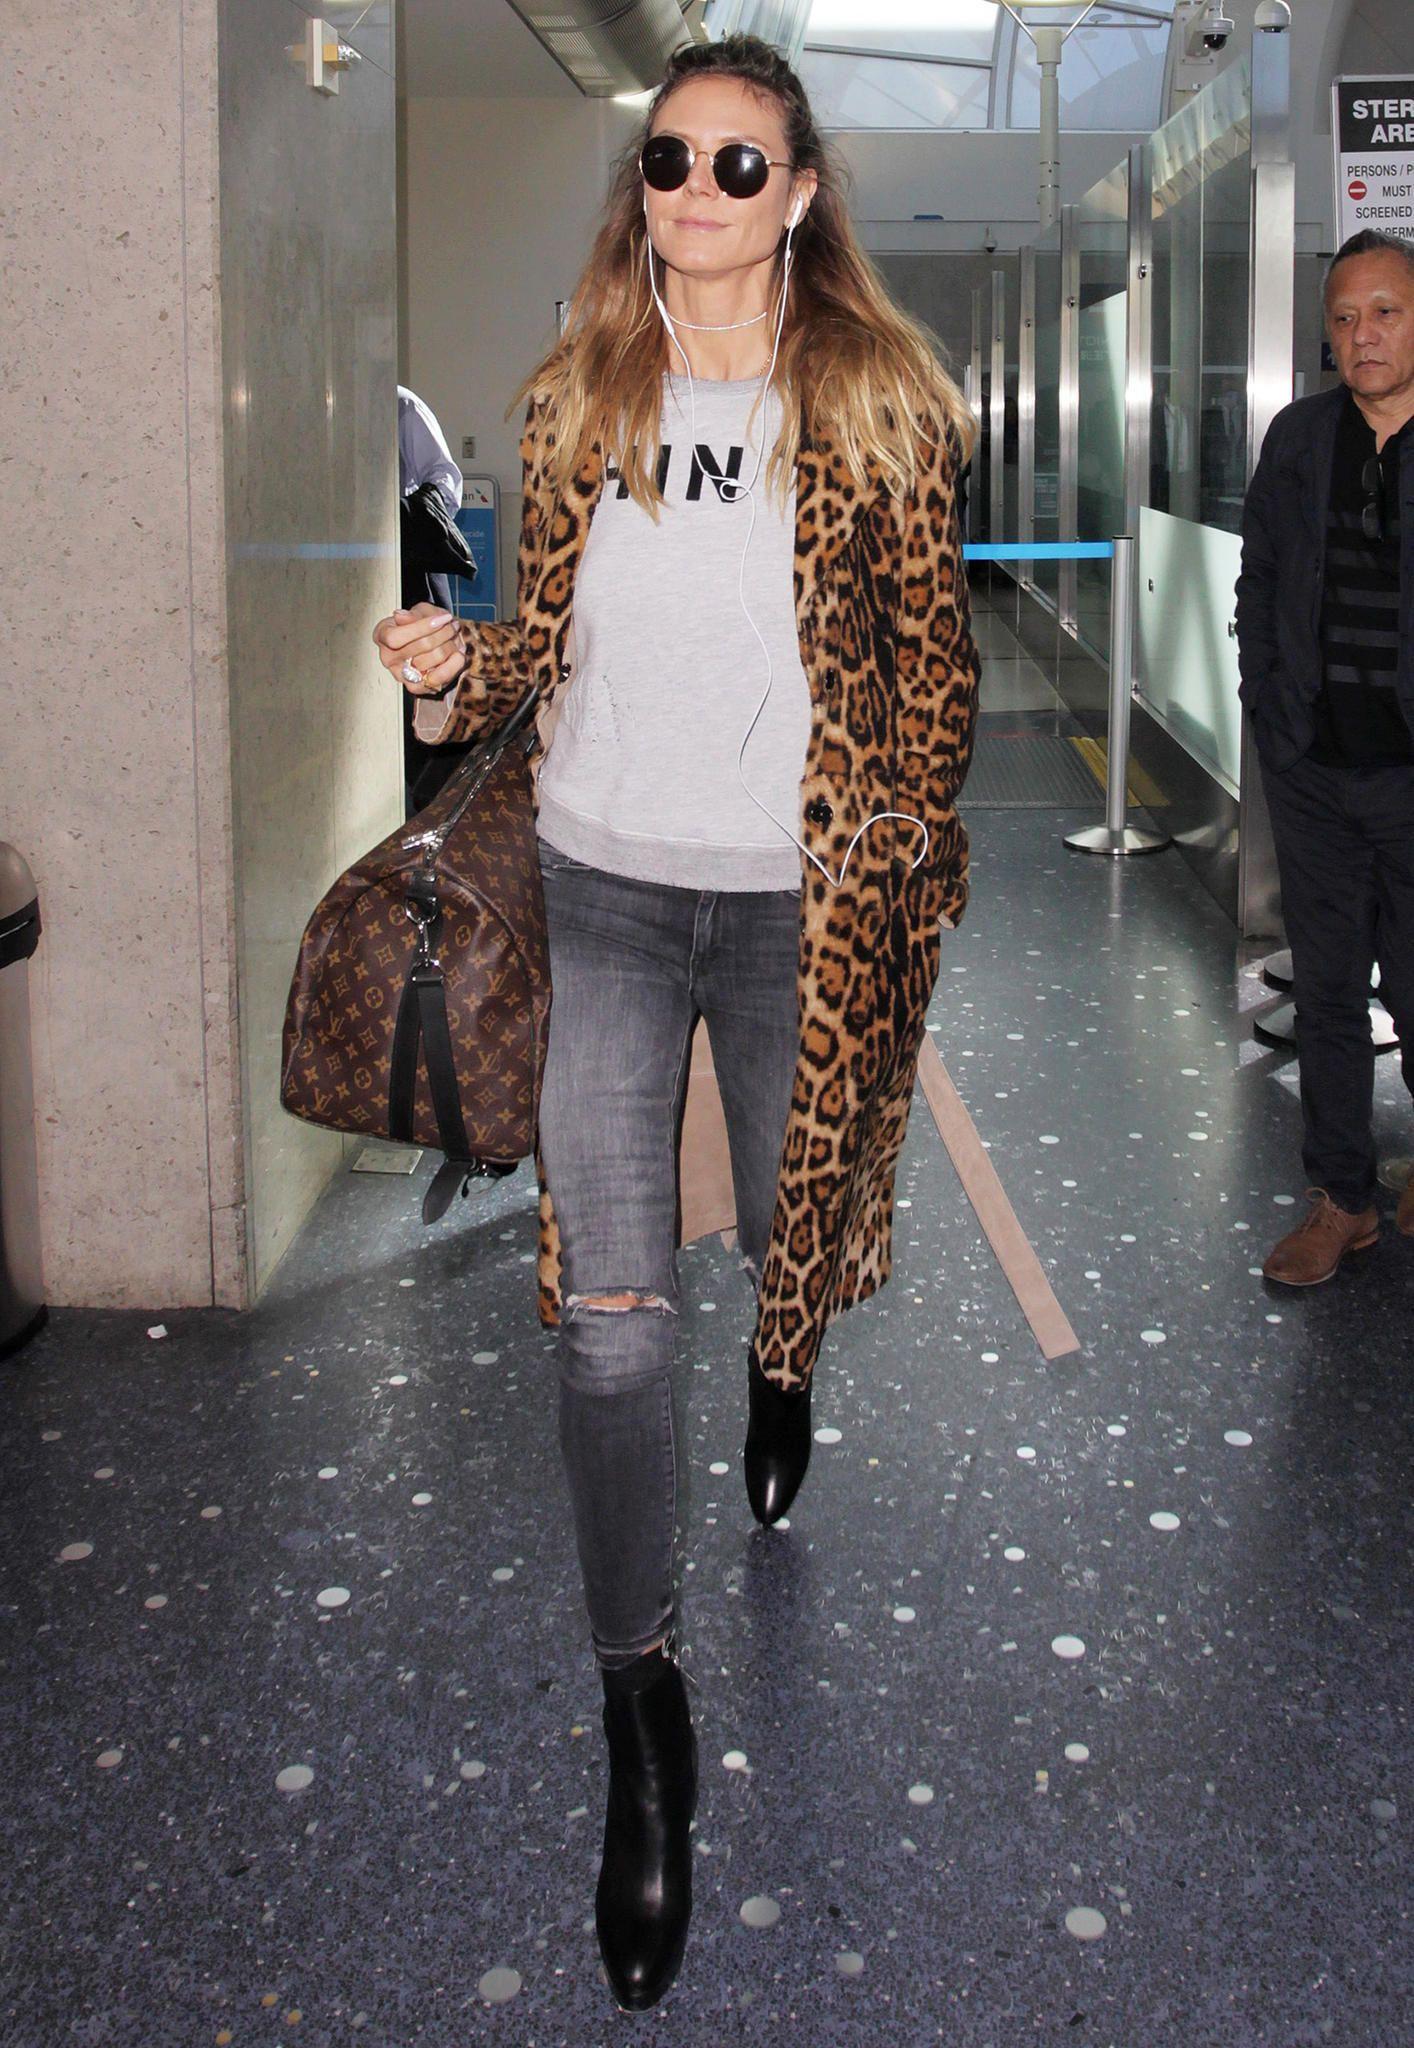 You can get this look heidi klum style, Heidi Klum